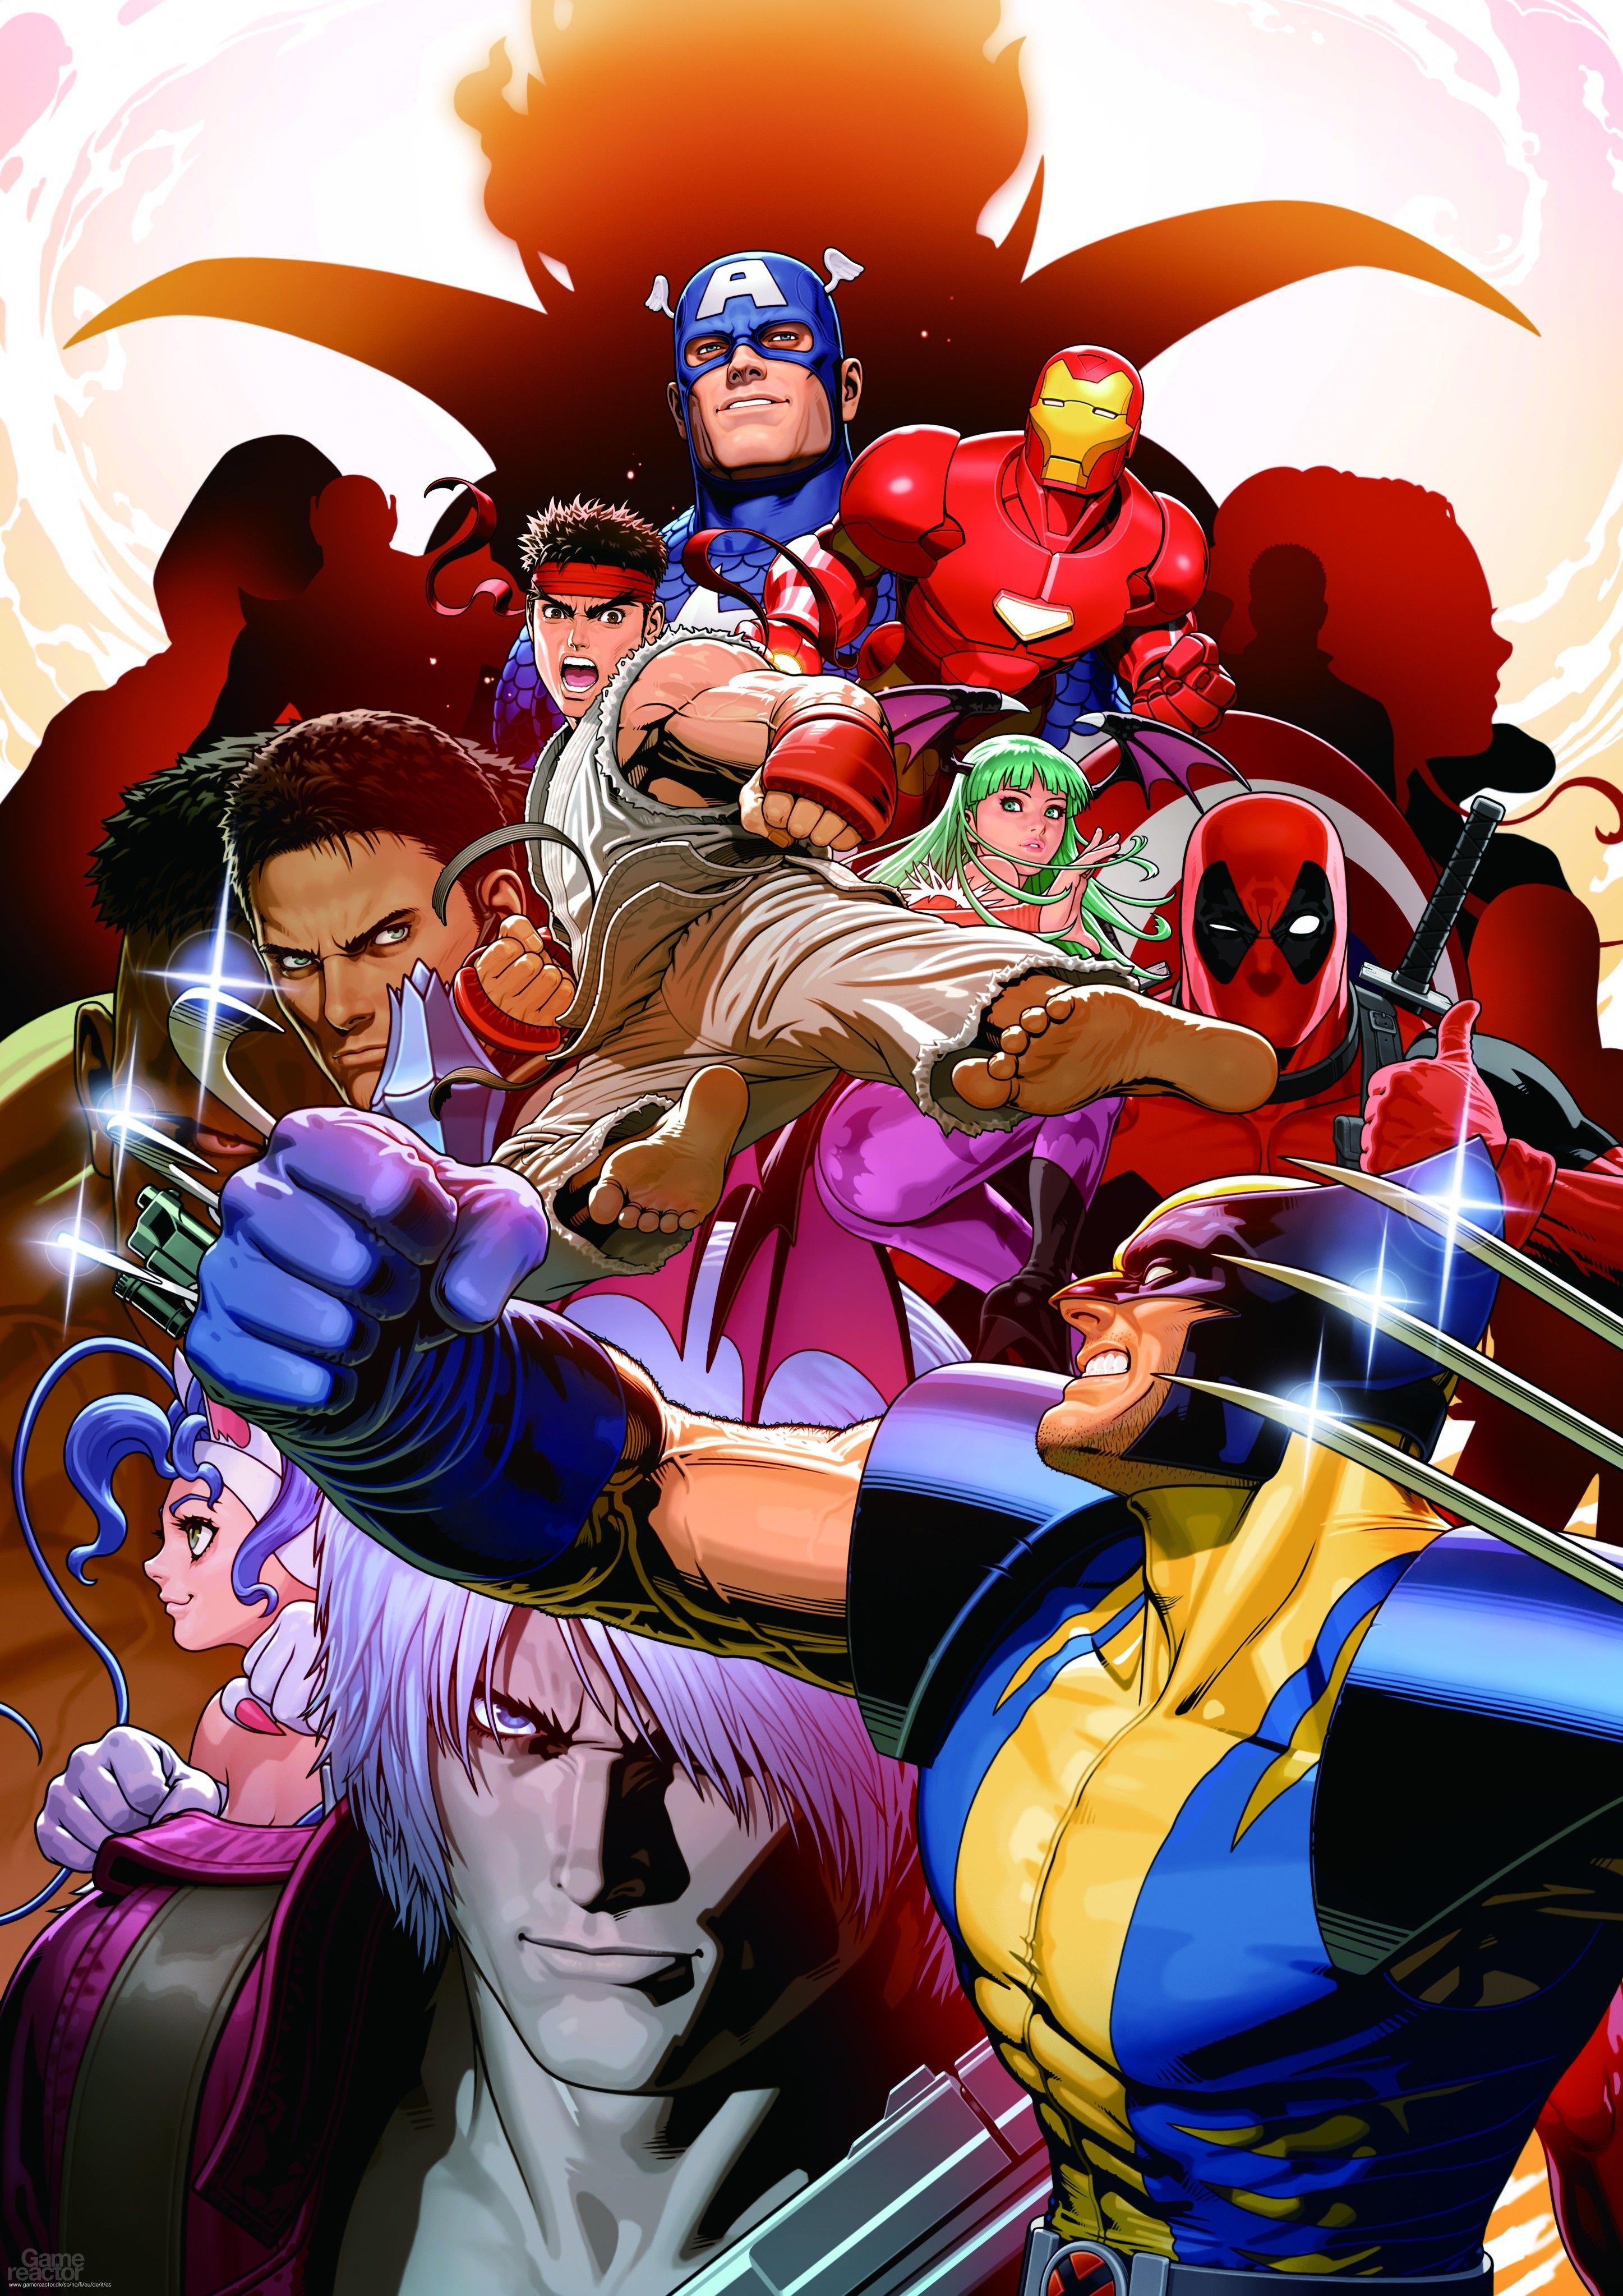 Marvel Vs Capcom 3 Fate Of Two Worlds 1920x1080 For Desktop